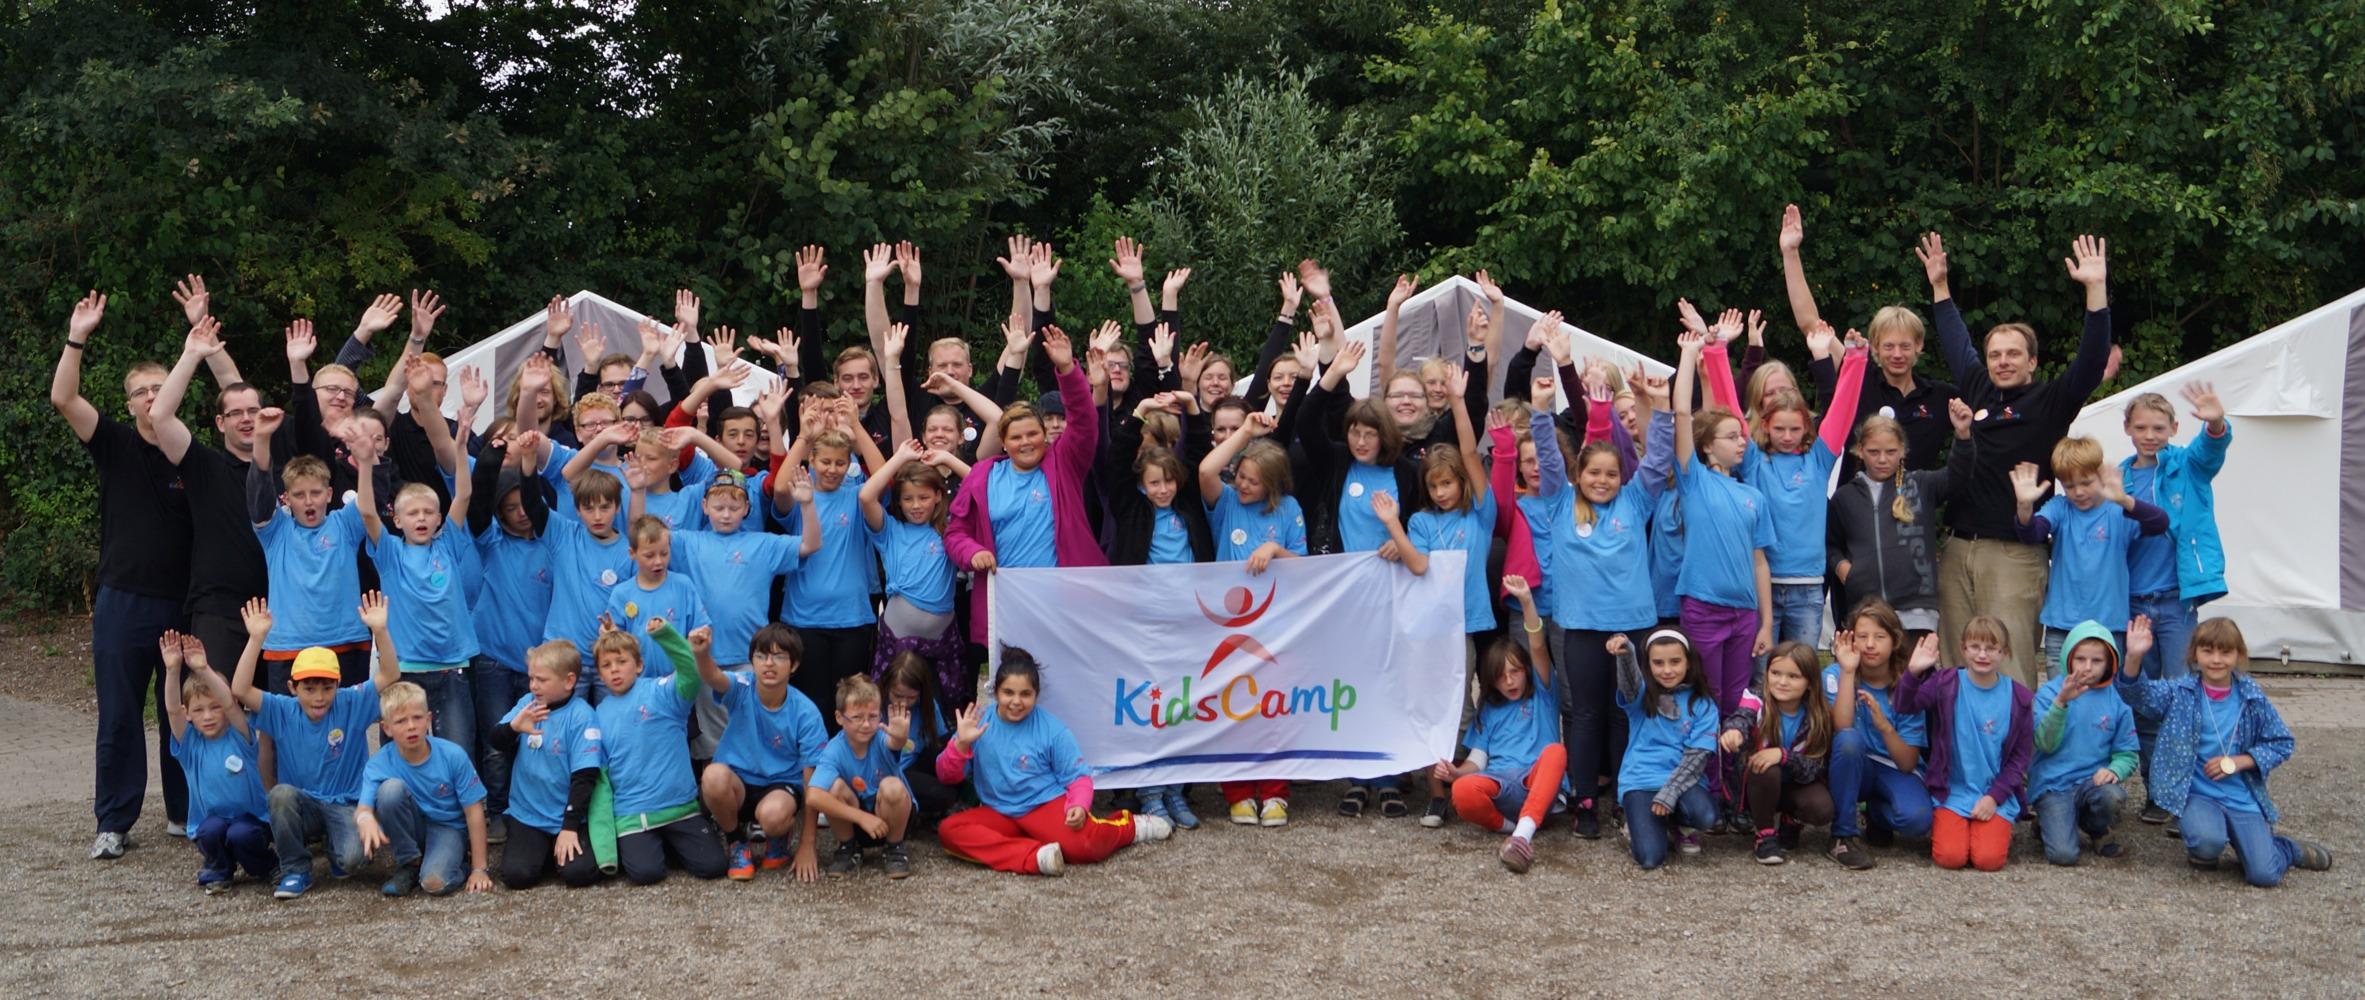 KidsCamp Gruppe